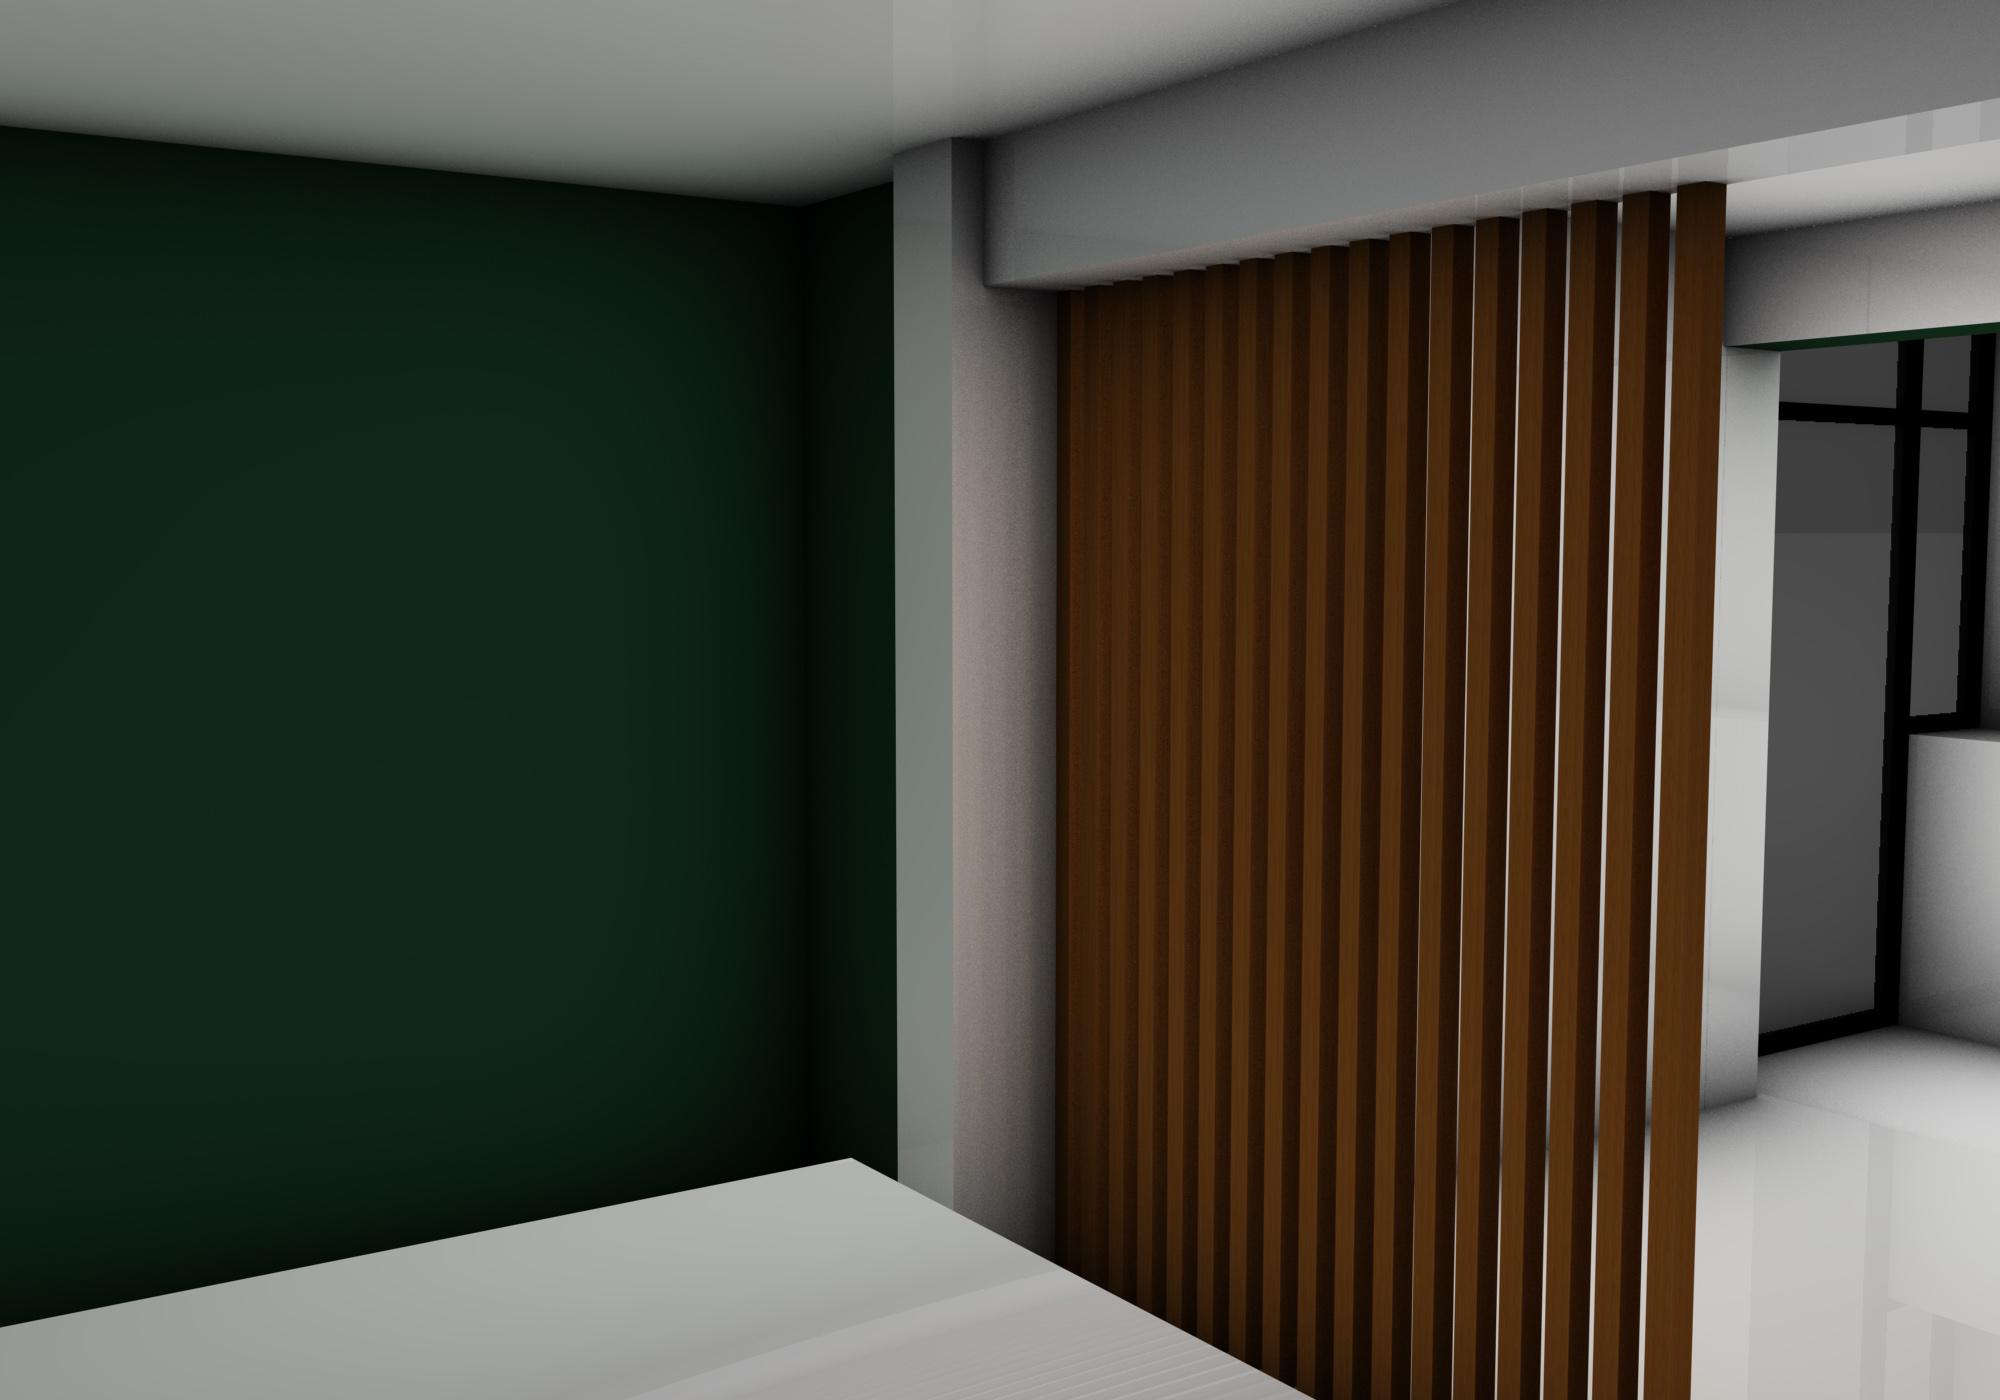 cloison amovible design finest cloison amovible fashion designs et cloison amovible pas cher. Black Bedroom Furniture Sets. Home Design Ideas